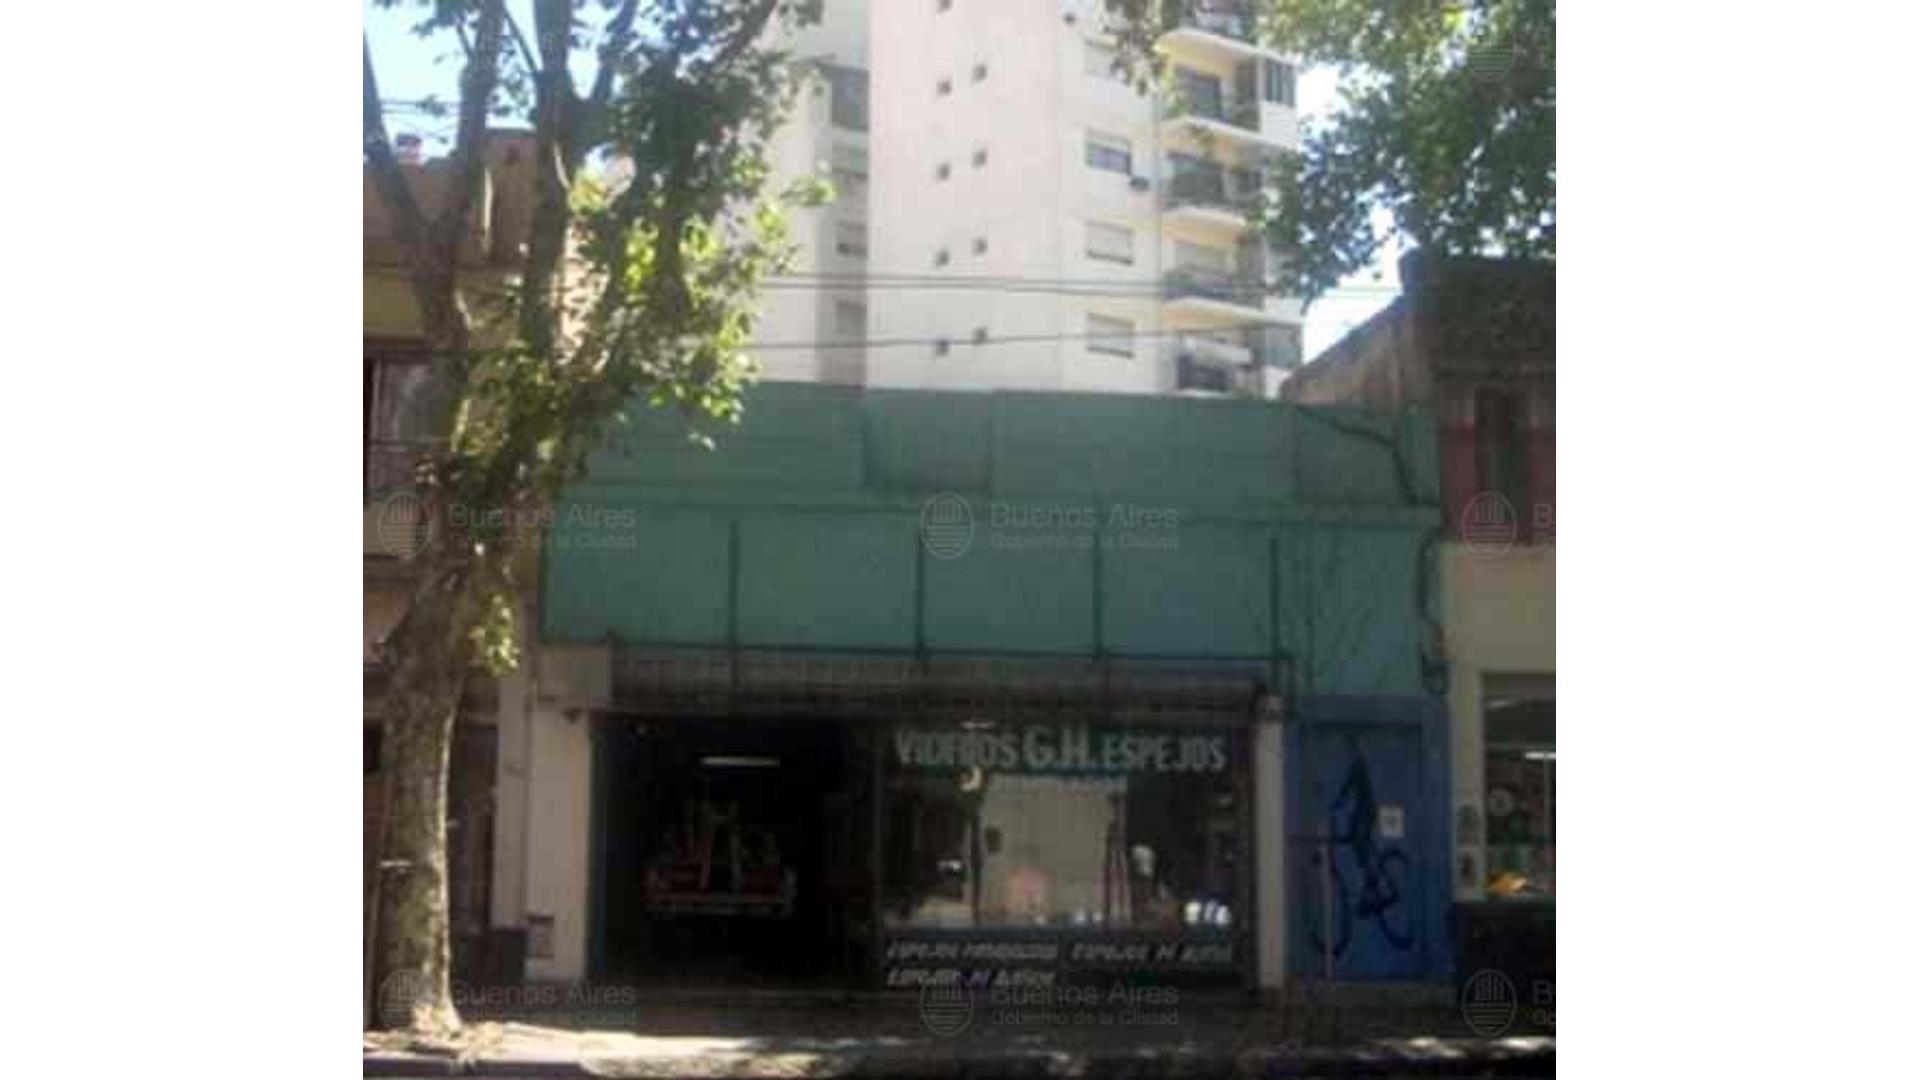 Diaz Velez 5563 Terreno en Venta de 266 m2 en Caballito.